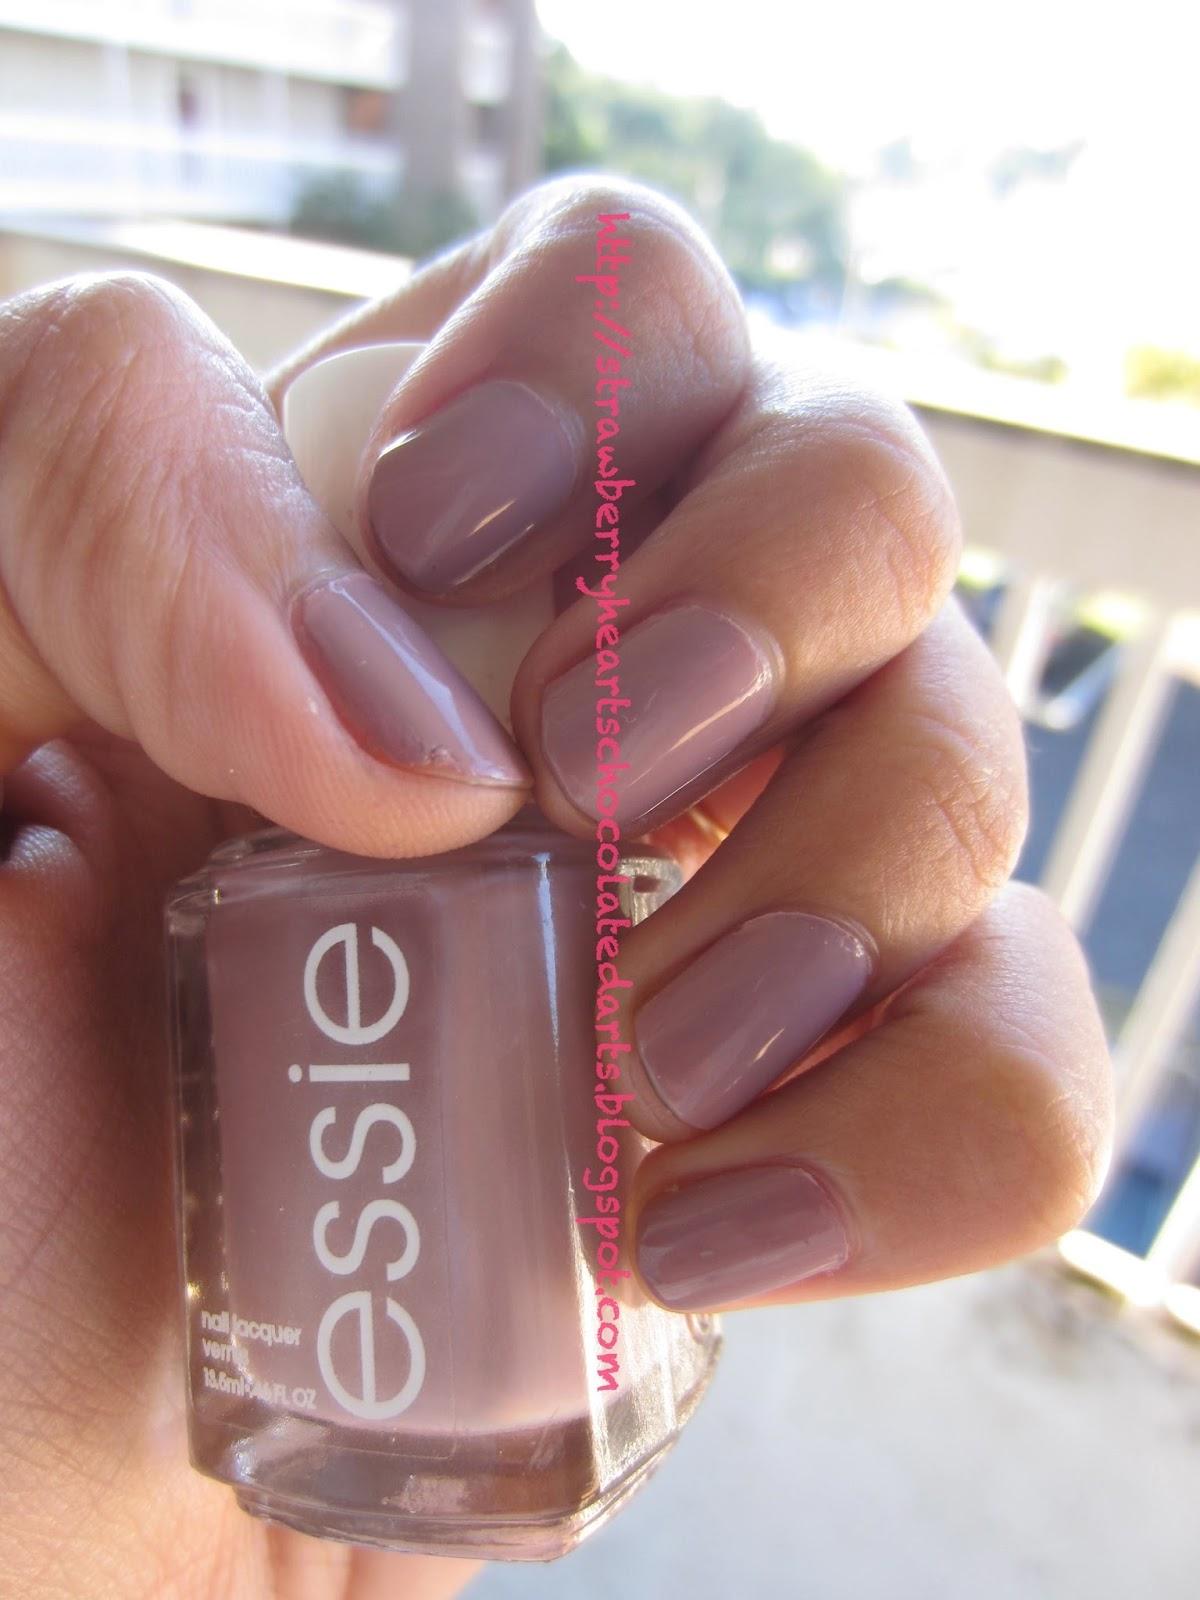 Strawberry Hearts Chocolate Darts Essie Nail Polish Lady Like Neutral Manicure For Fall Autumn